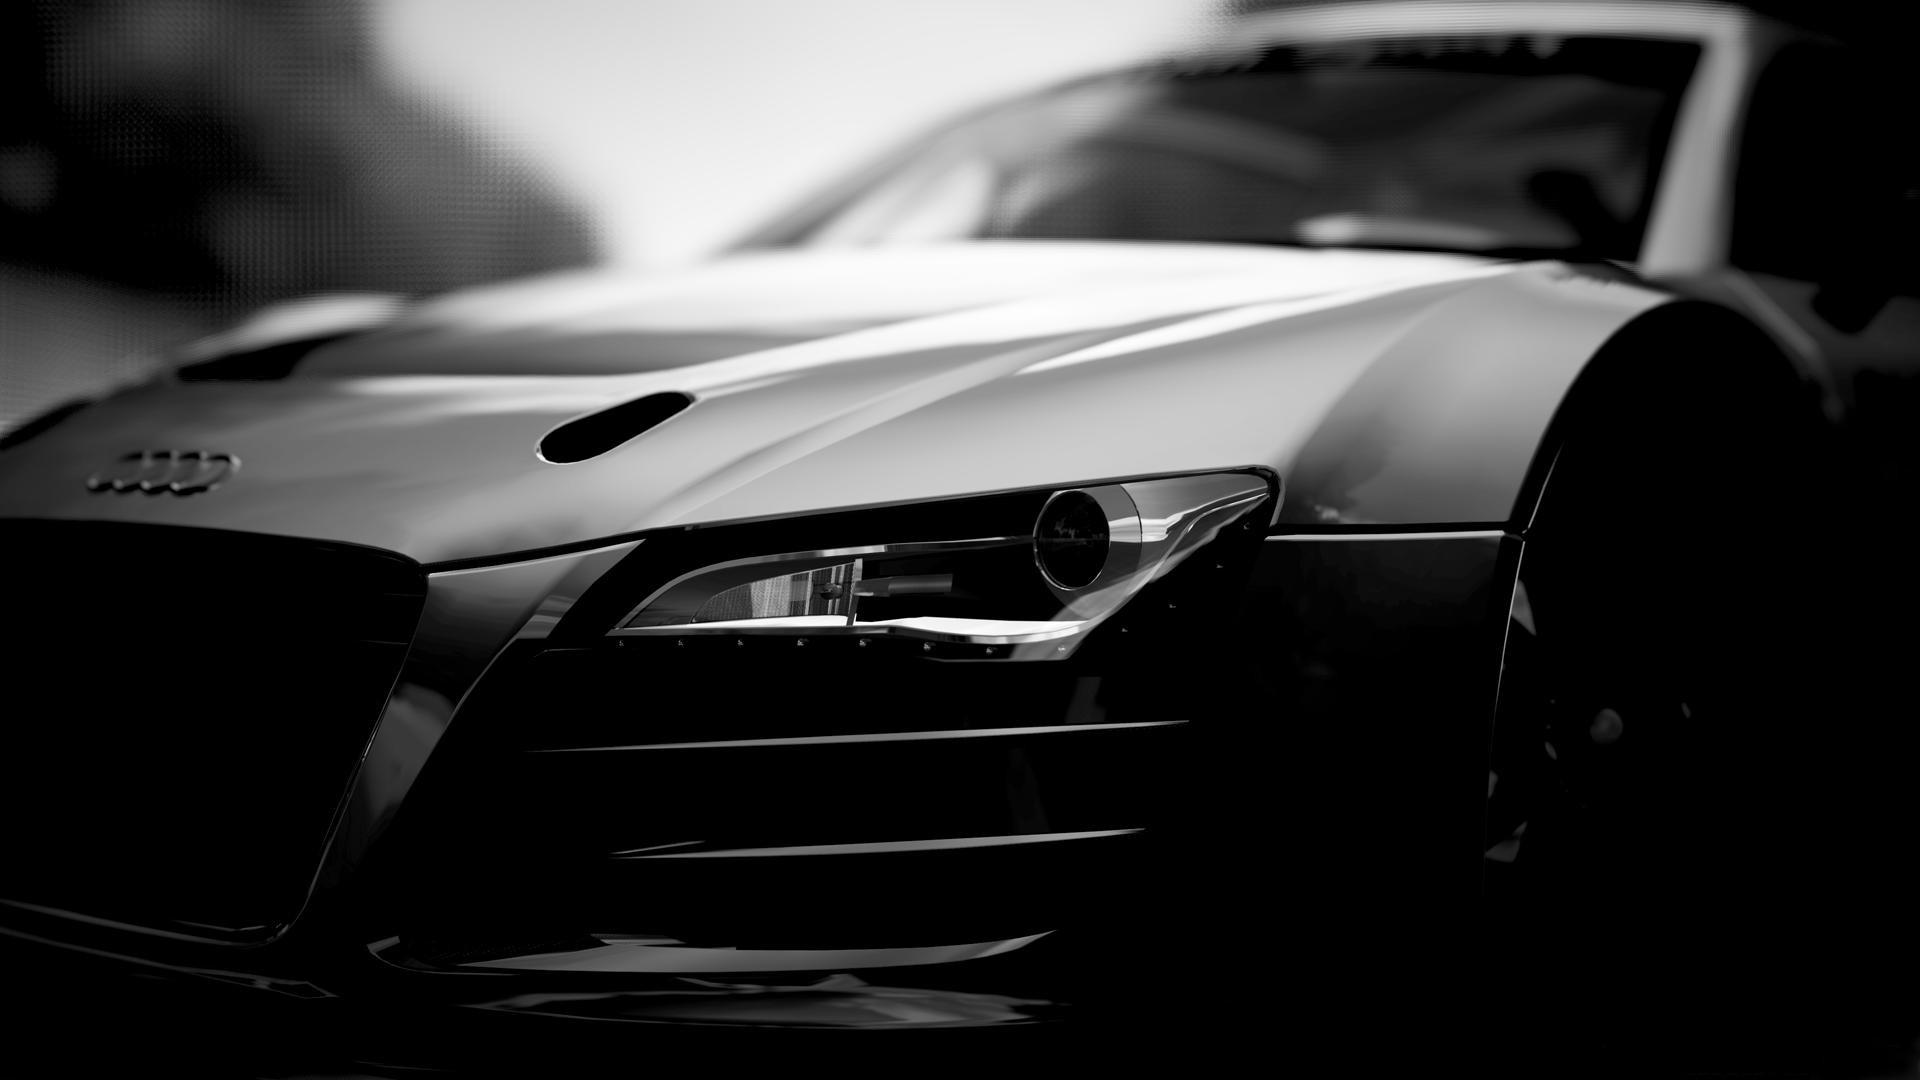 Audi R8 Cg Bw Wallpaper 1920x1080 31454 Wallpaperup